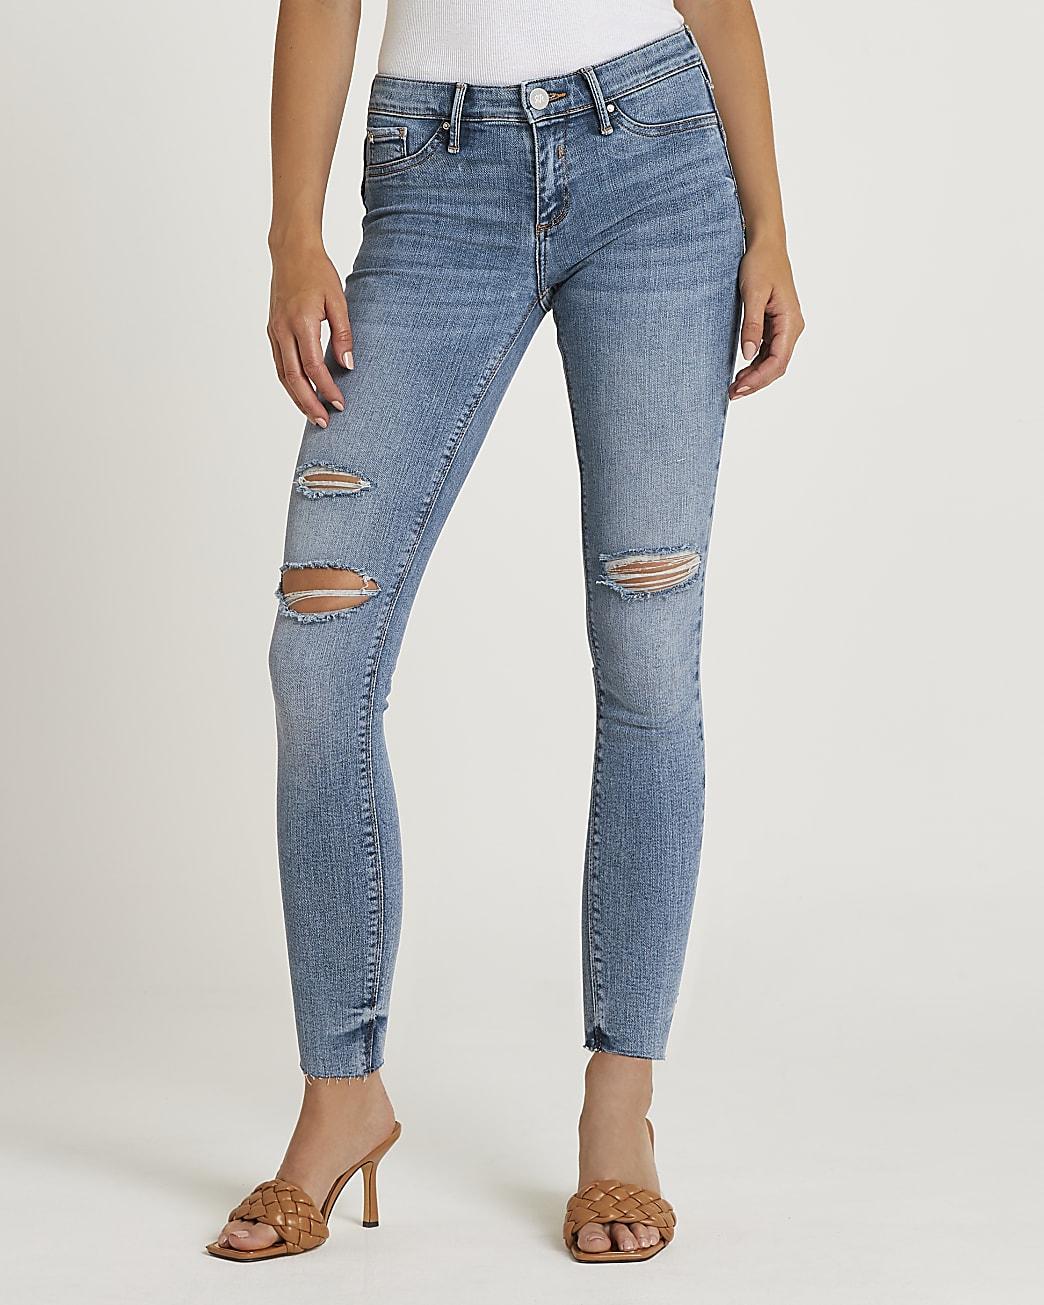 Blue Molly low rise bum sculpt skinny jeans